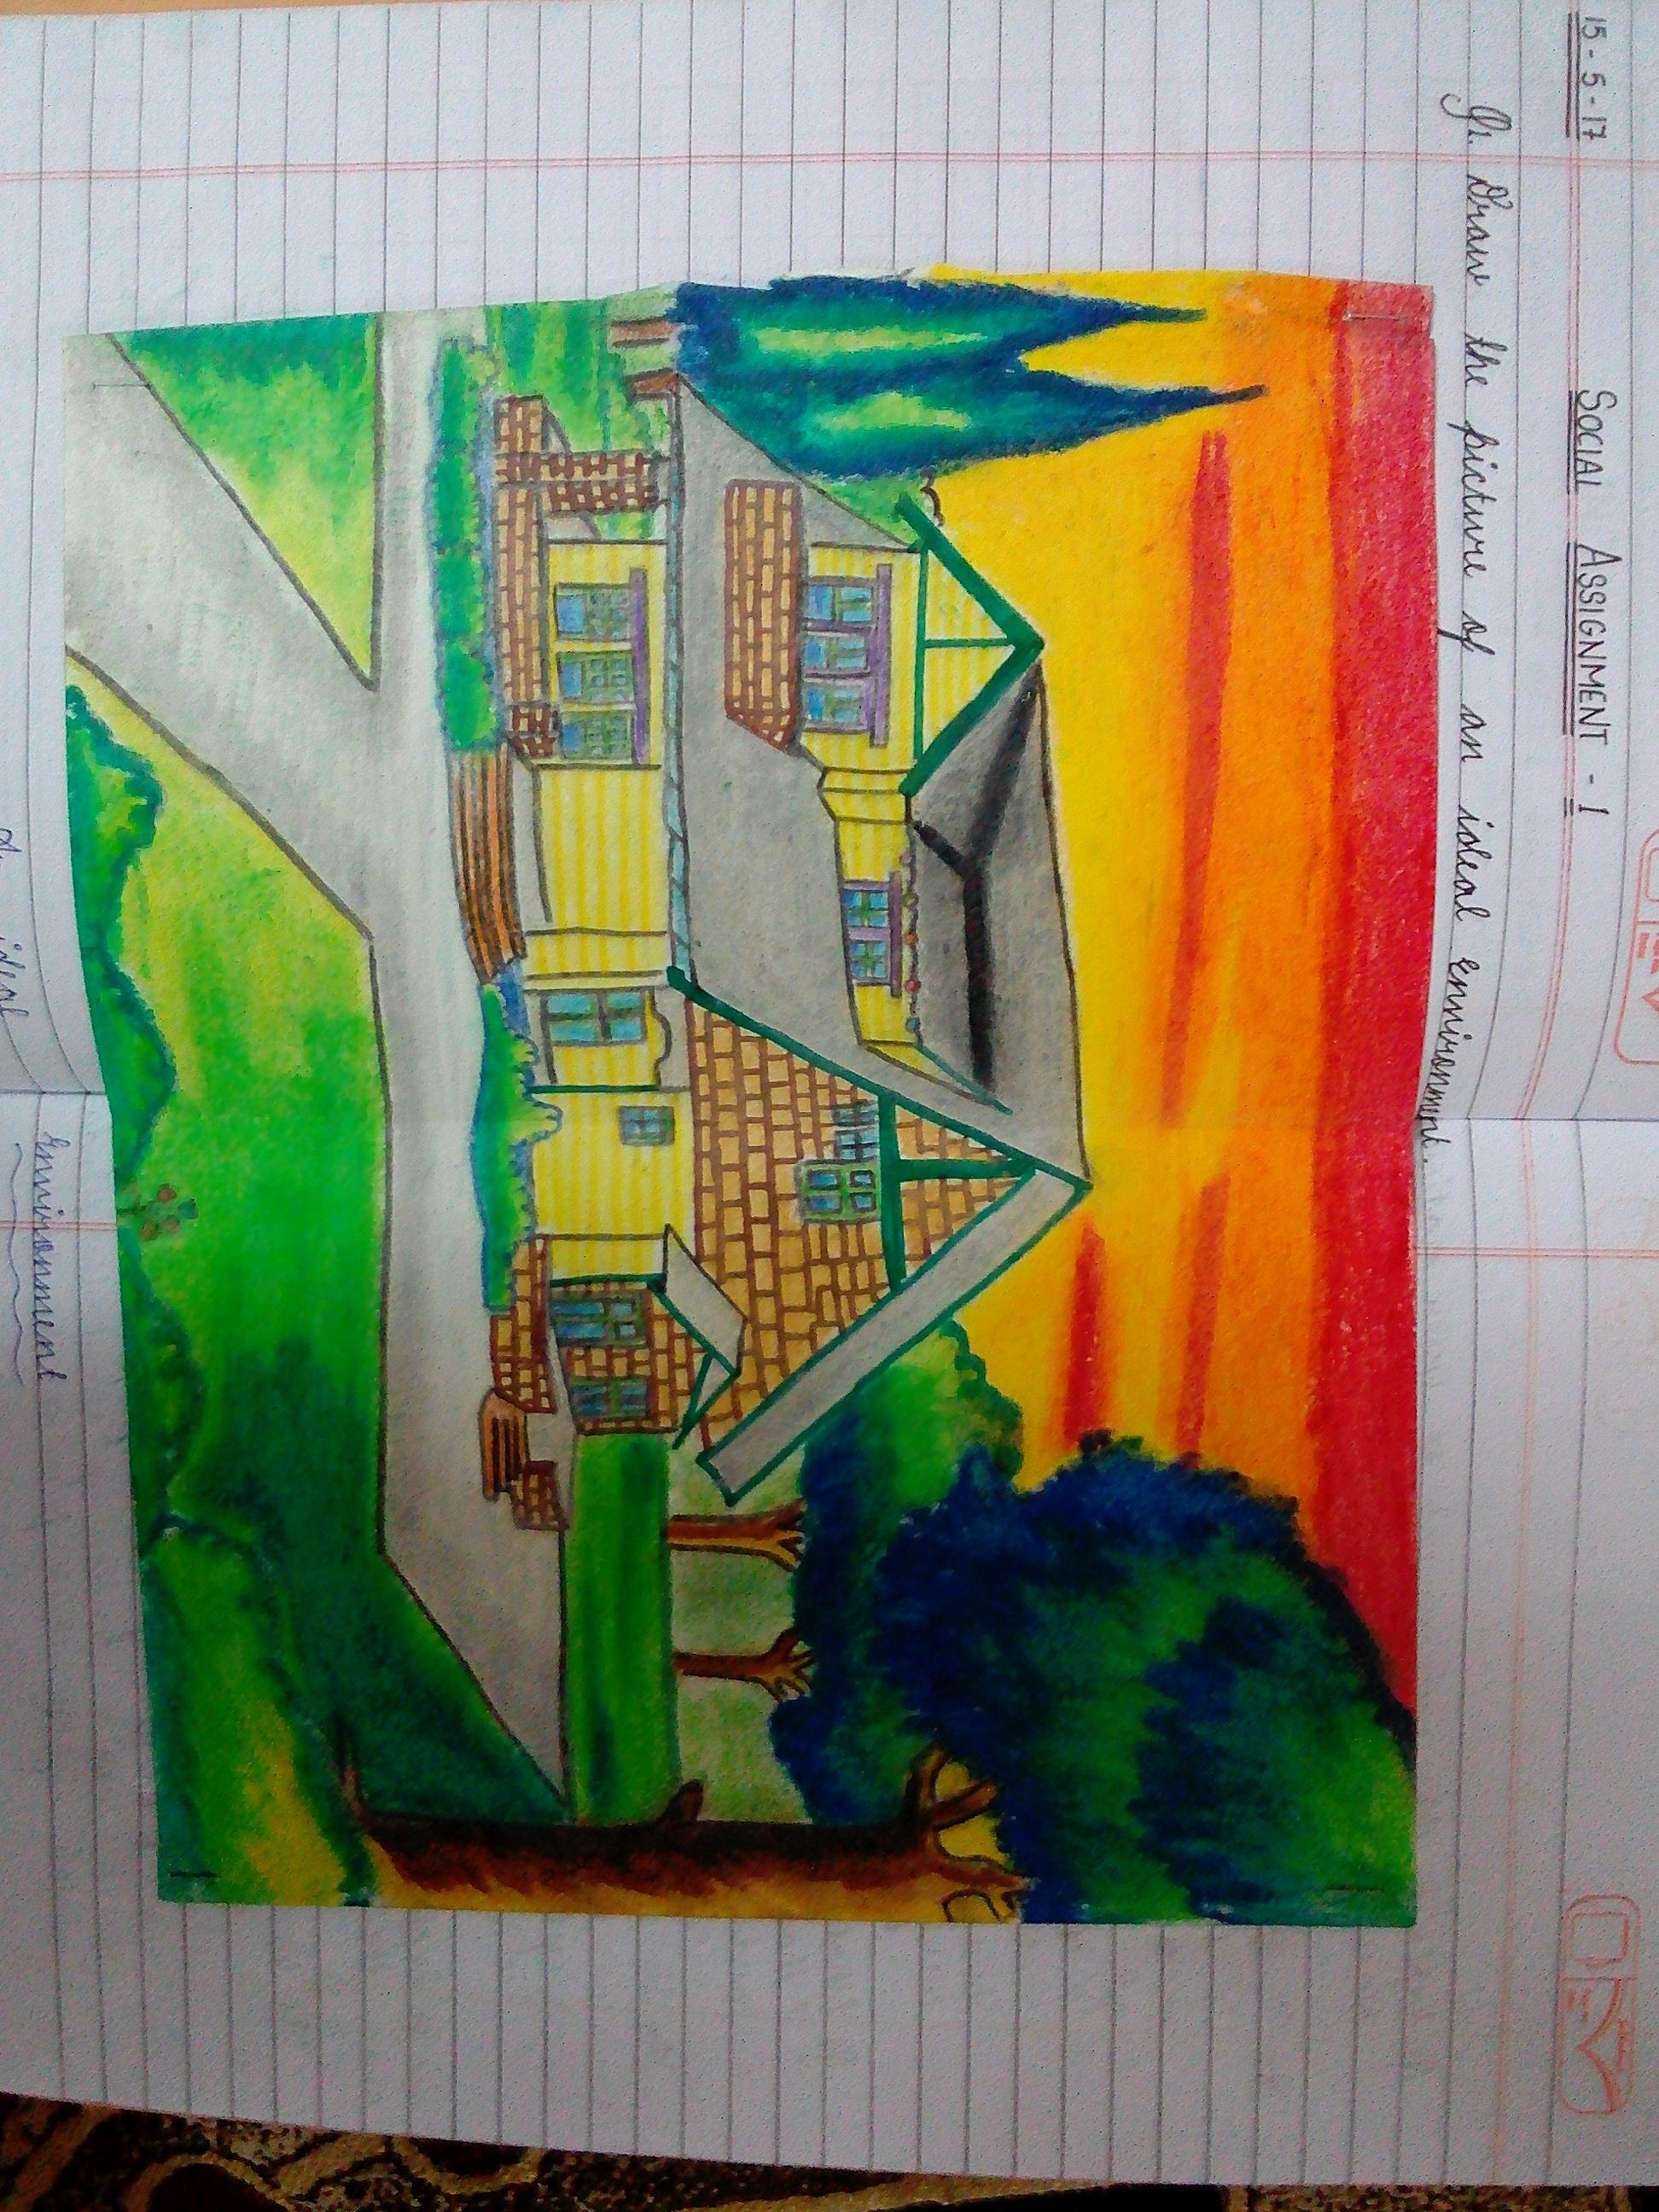 Admission essay on trigonometry